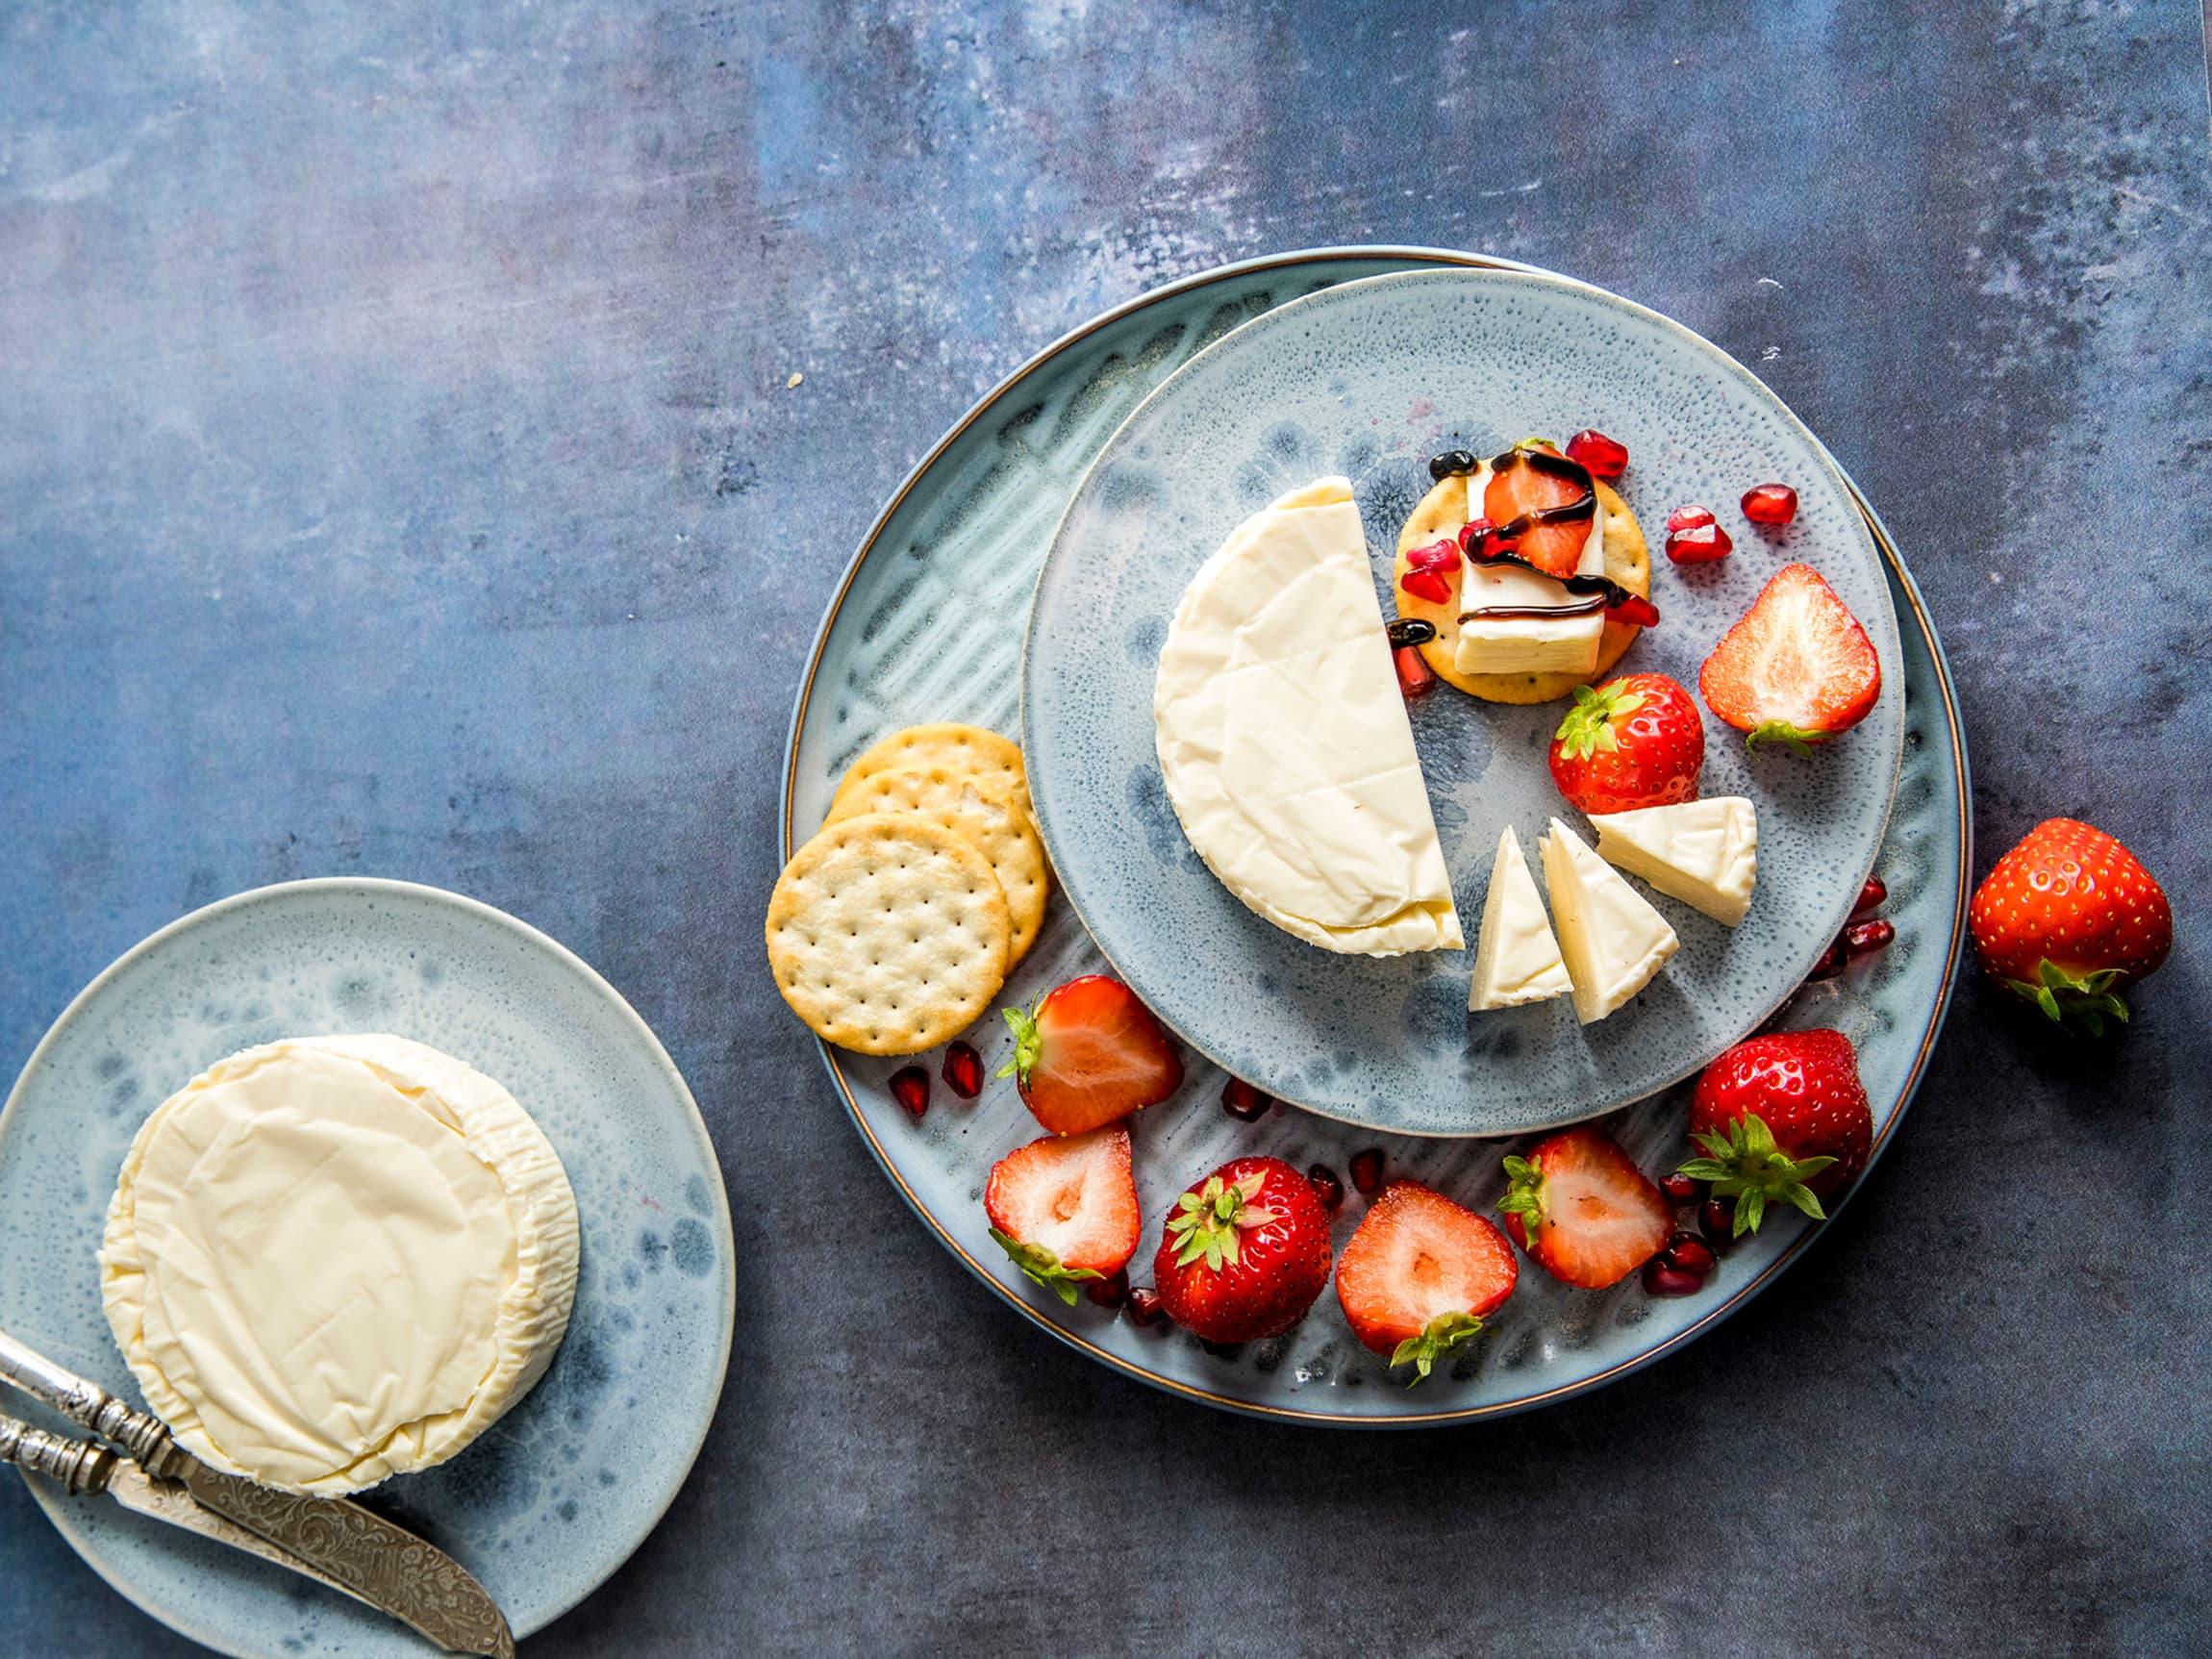 Prøv klassikeren Fryd Crème Kirsebær med salt kjeks og friske jordbær. Pynt med Saba - tyktflytende balsamico fra Modena.